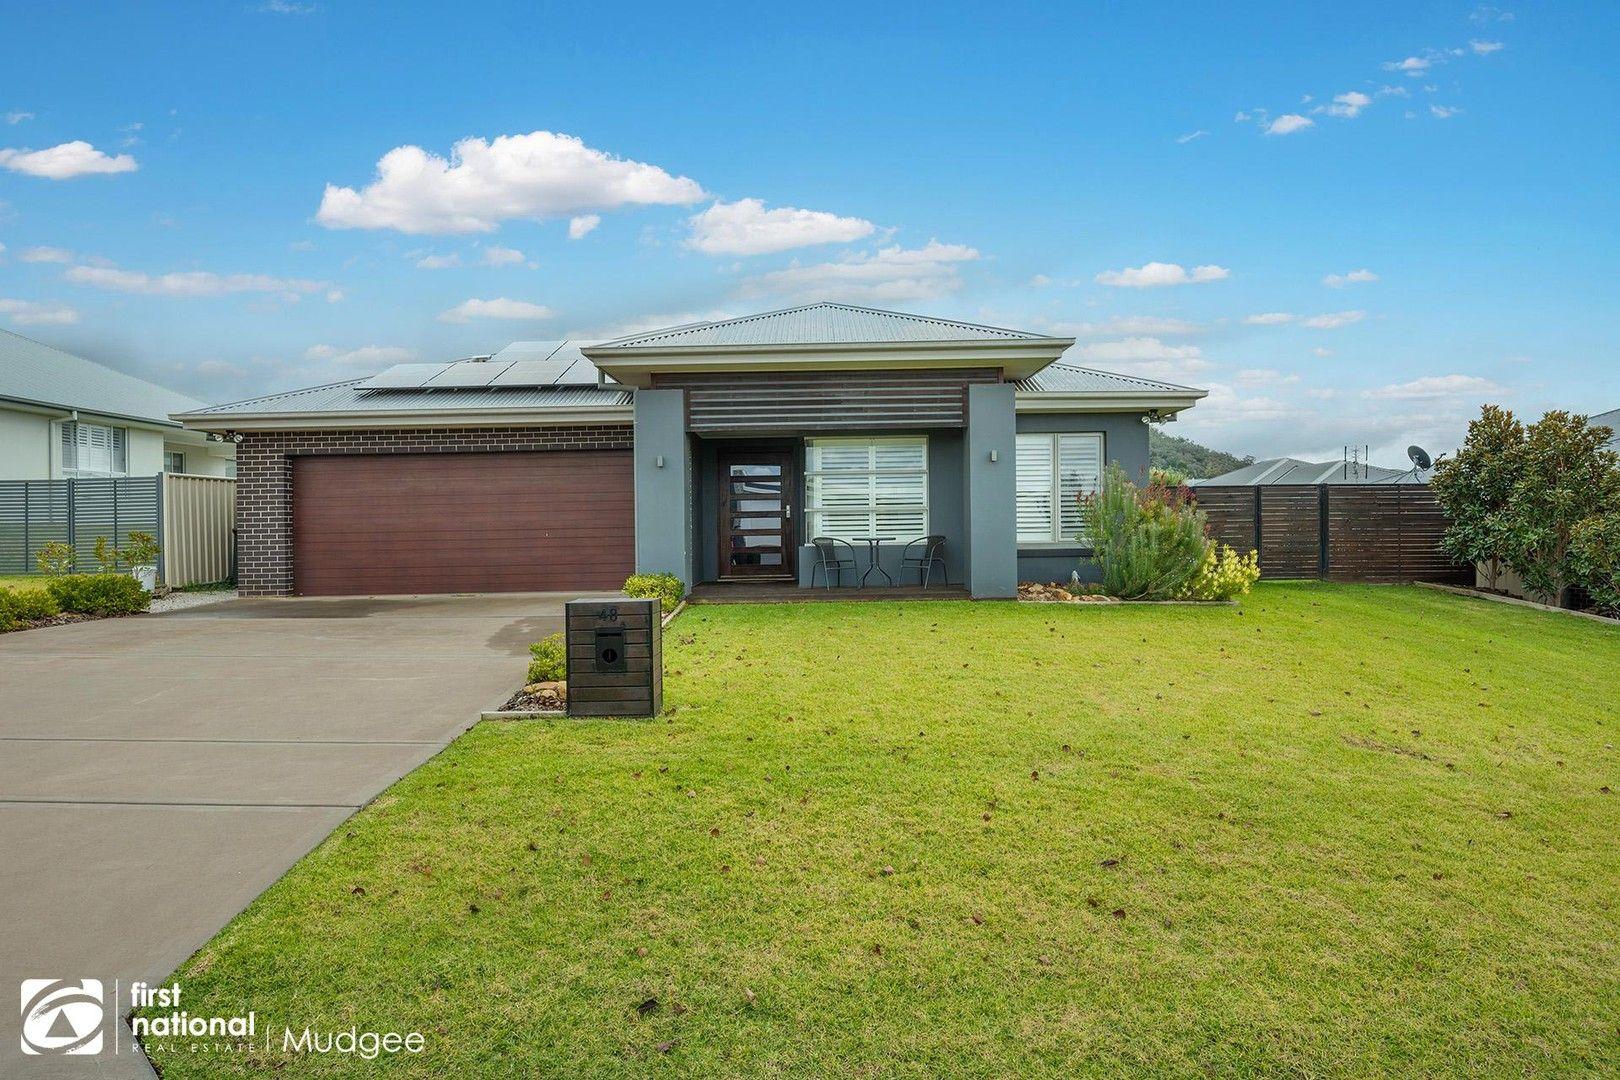 48 Melton Road, Mudgee NSW 2850, Image 0